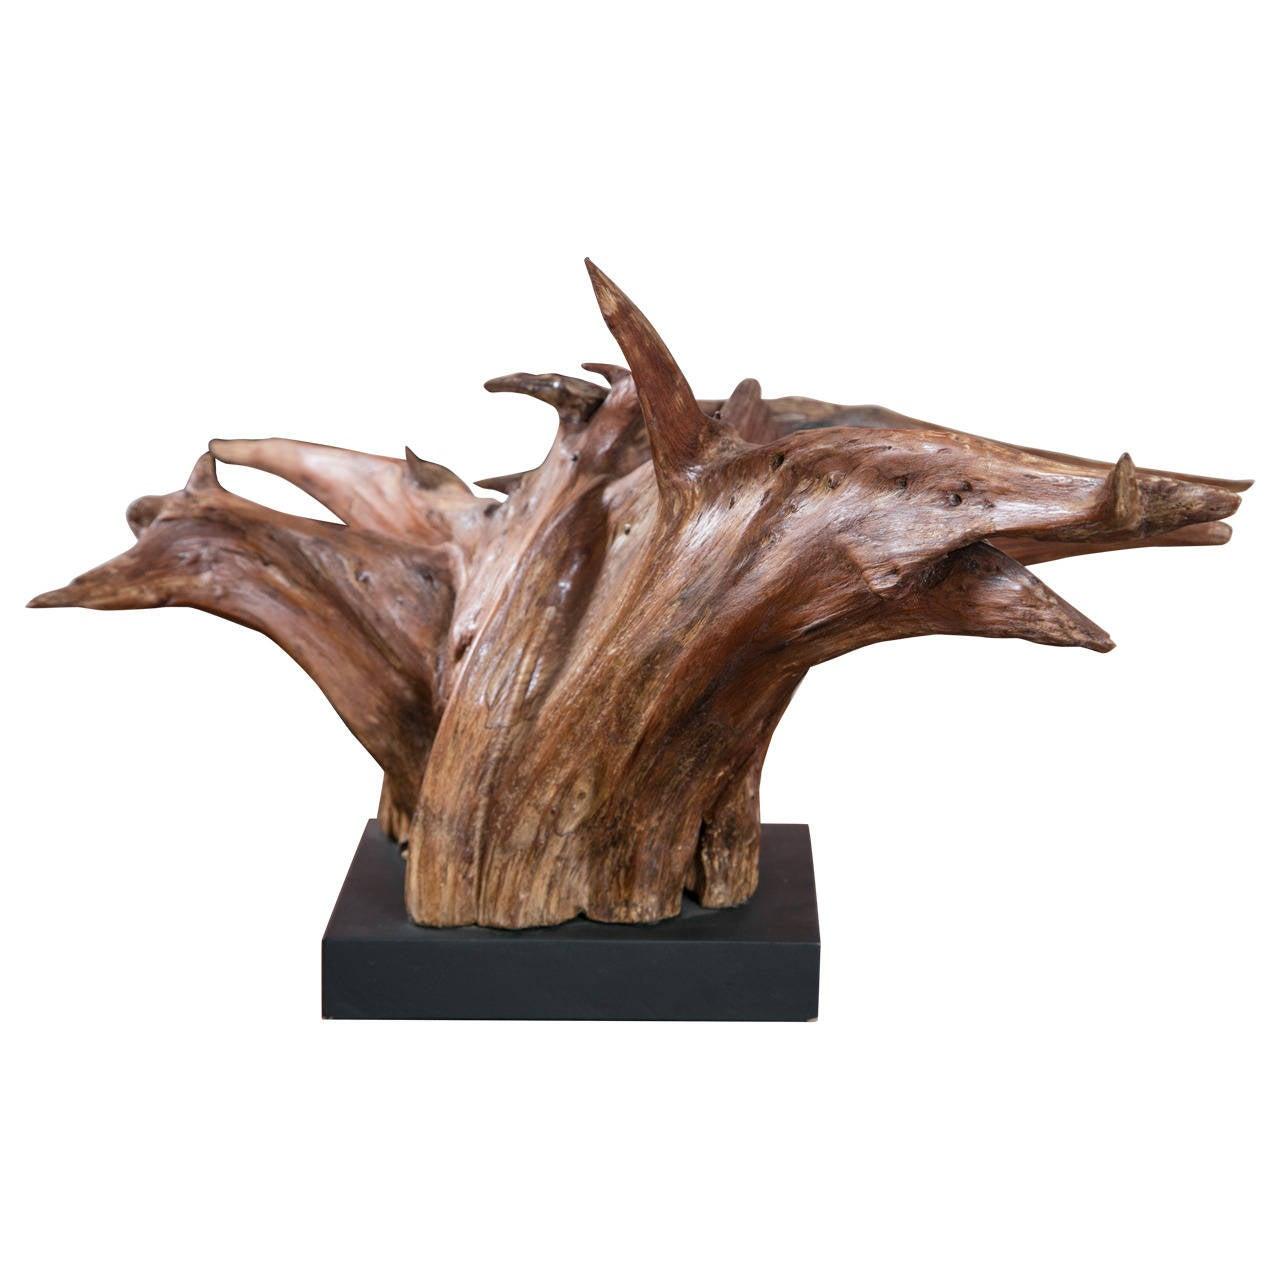 mounted driftwood sculpture at 1stdibs. Black Bedroom Furniture Sets. Home Design Ideas